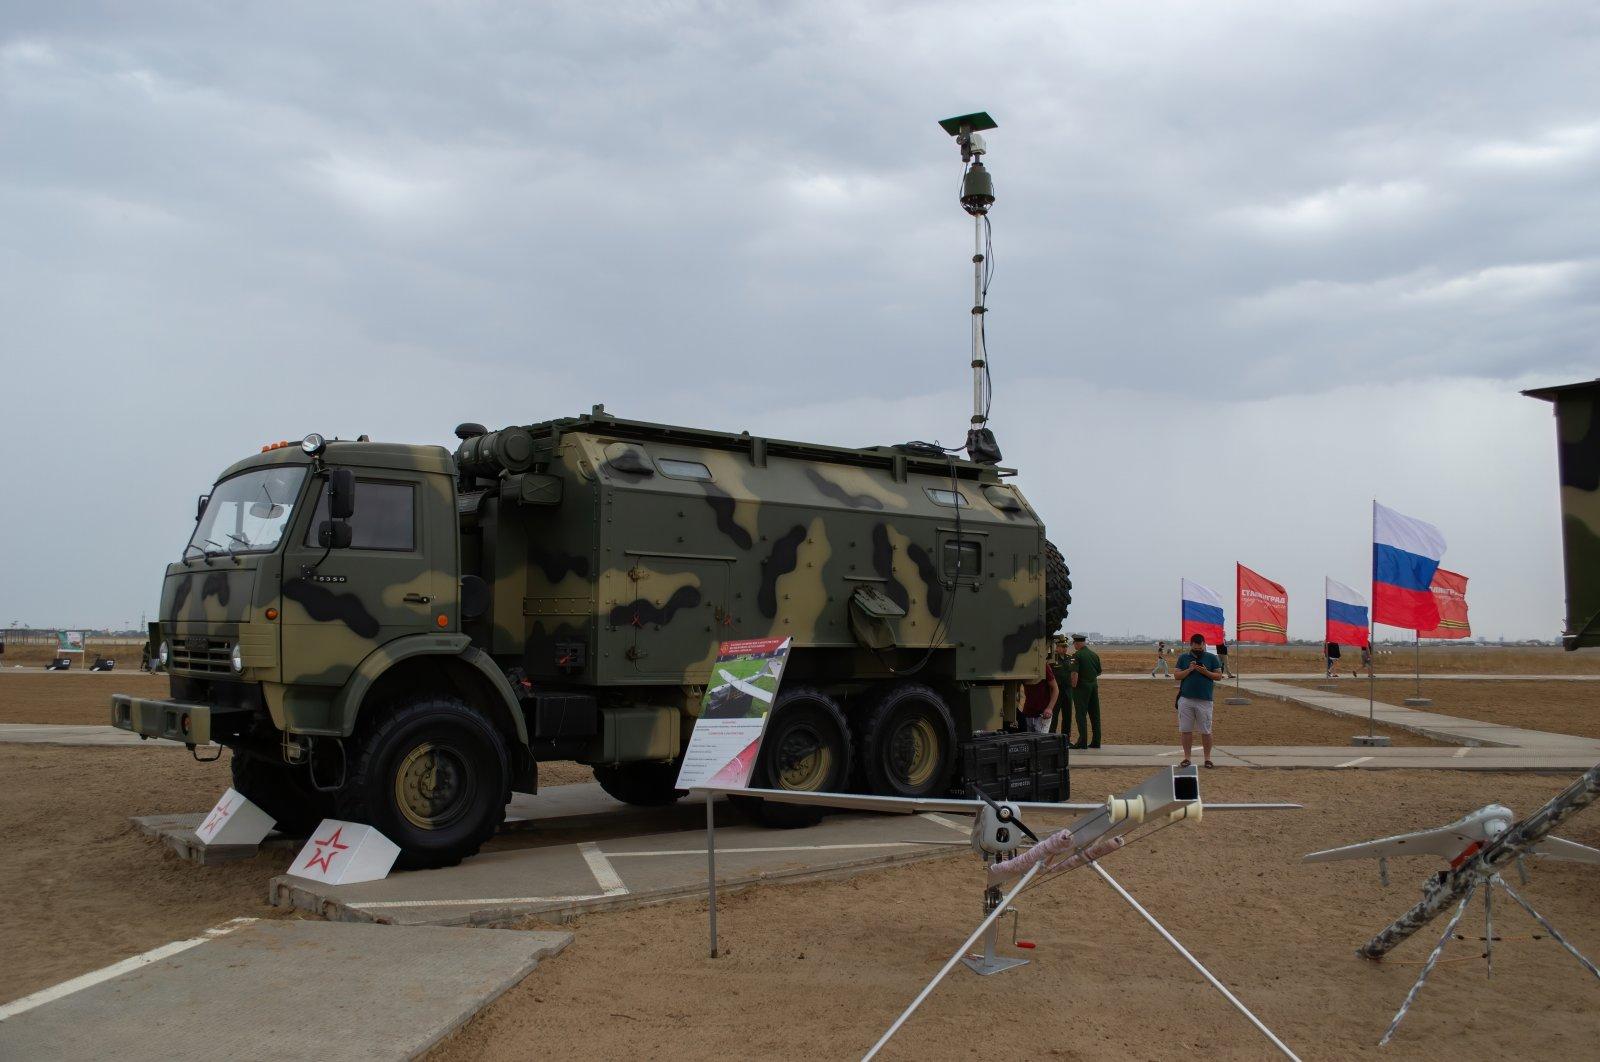 The Russian UAV Orlan-10 complex at the exhibition of military equipment in the Patriot Park branch, Srednyaya Akhtuba, Volgograd region, Russia, Aug. 28, 2020. (Shutterstock Photo)